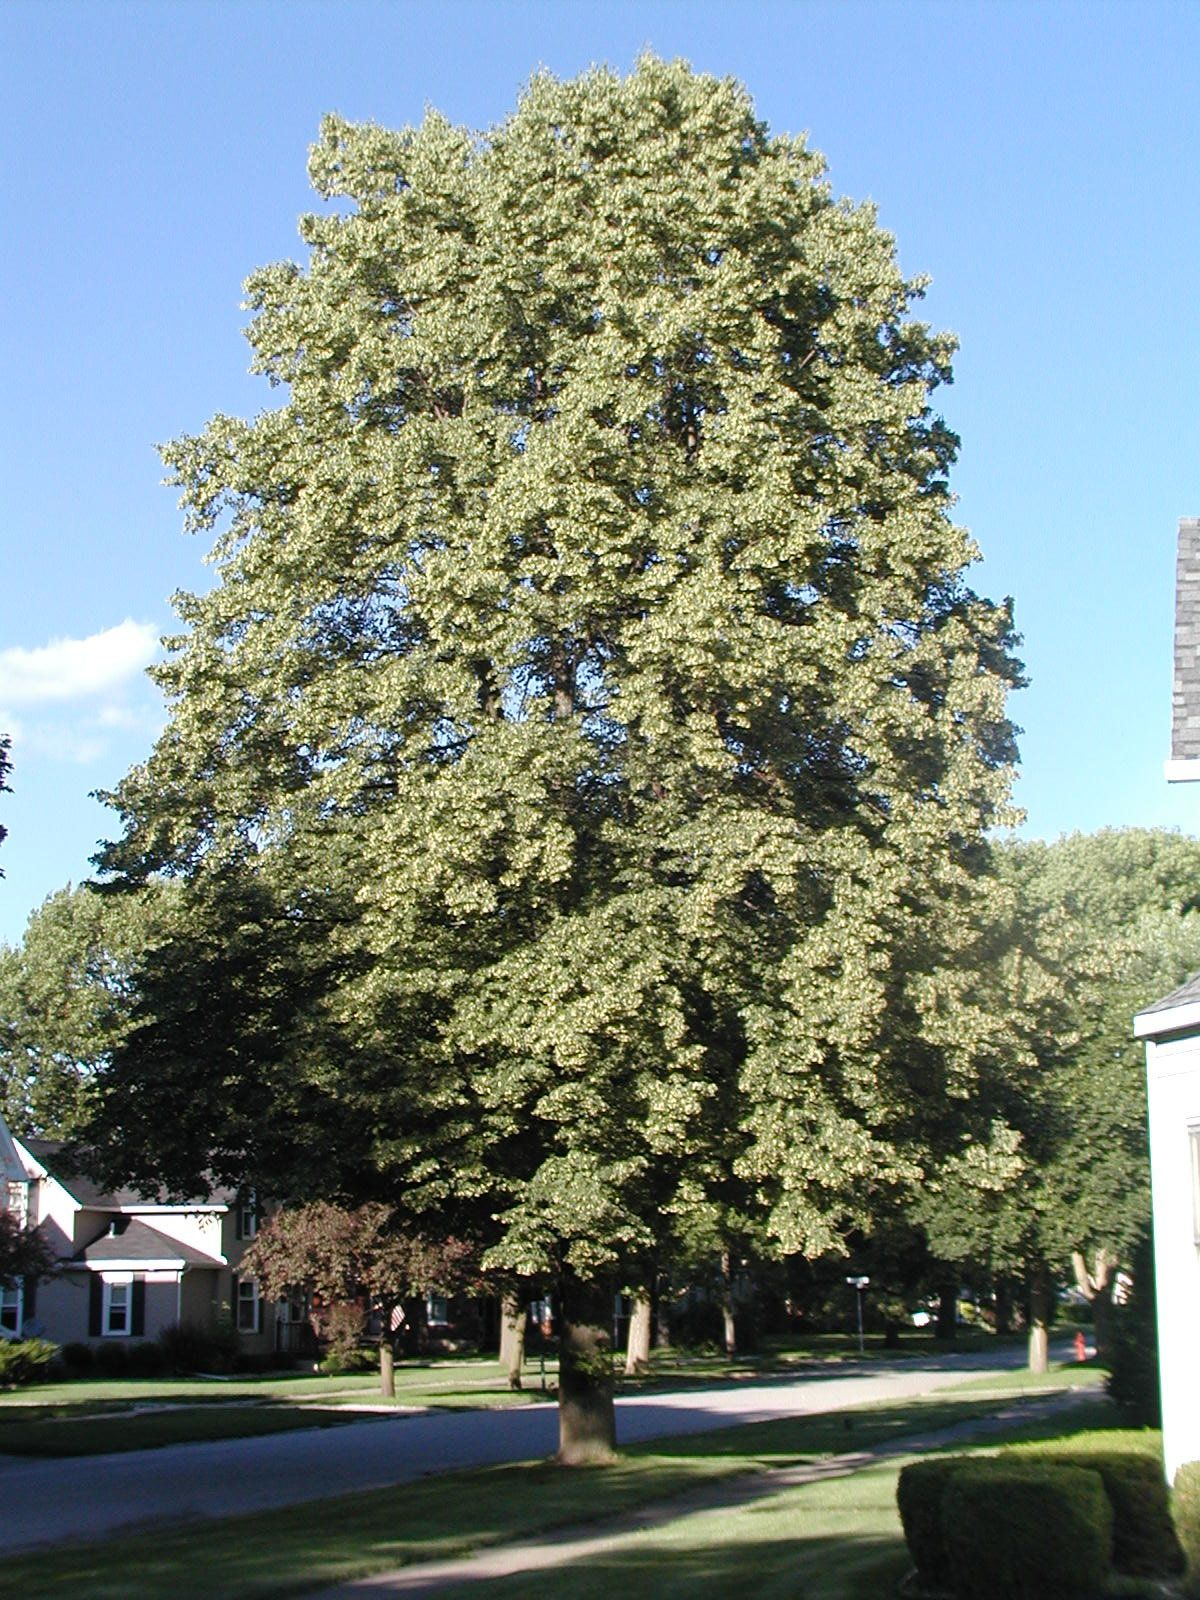 small-leaf-east-european-linden-tree.jpg 1,200×1,600 pixels | Trees ...